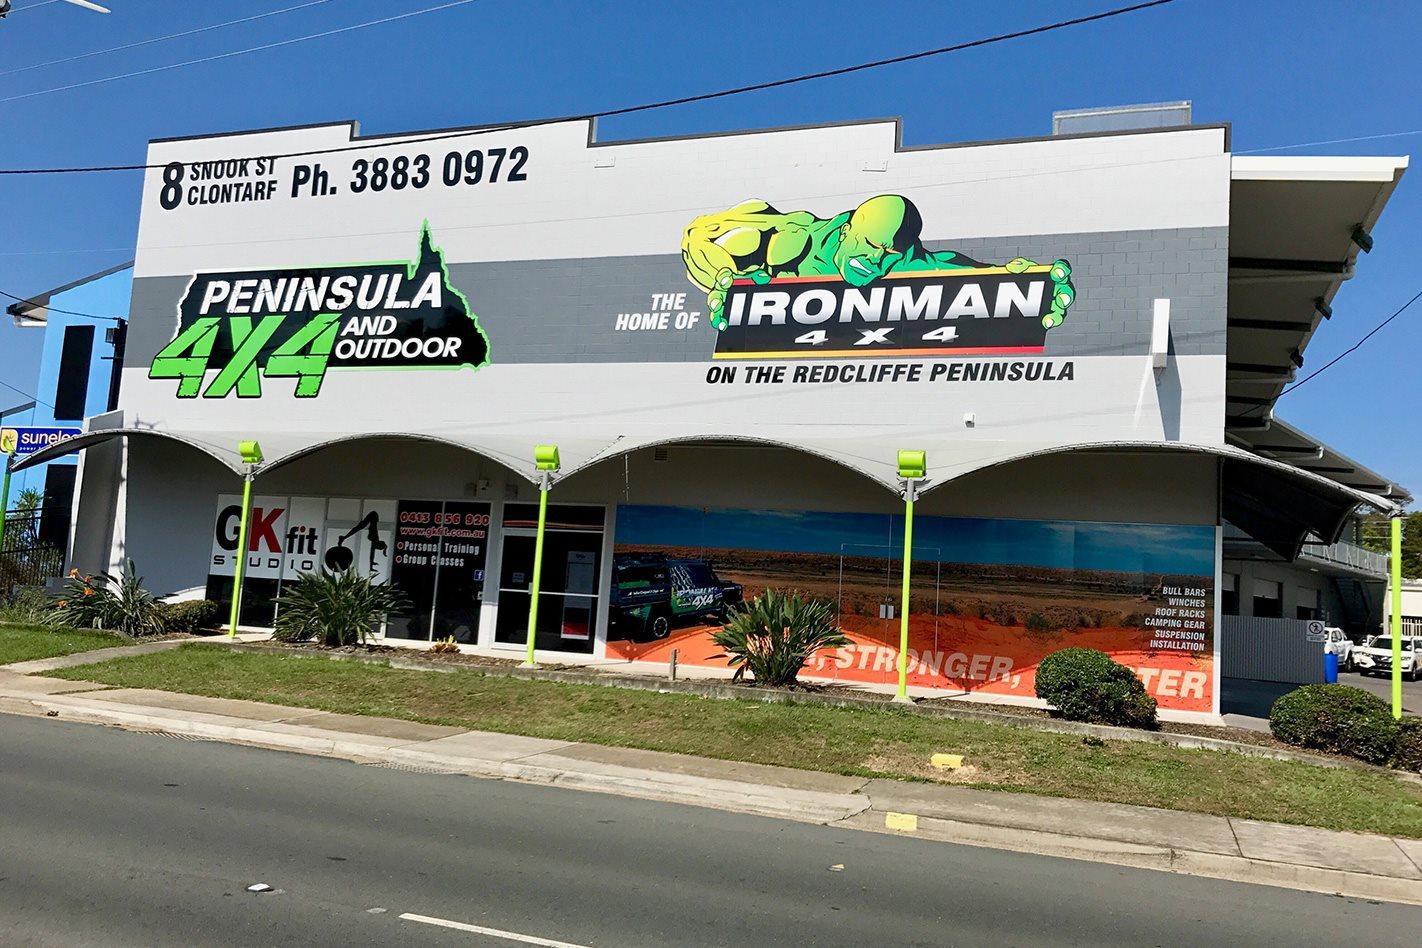 Ironman-4x4.jpg